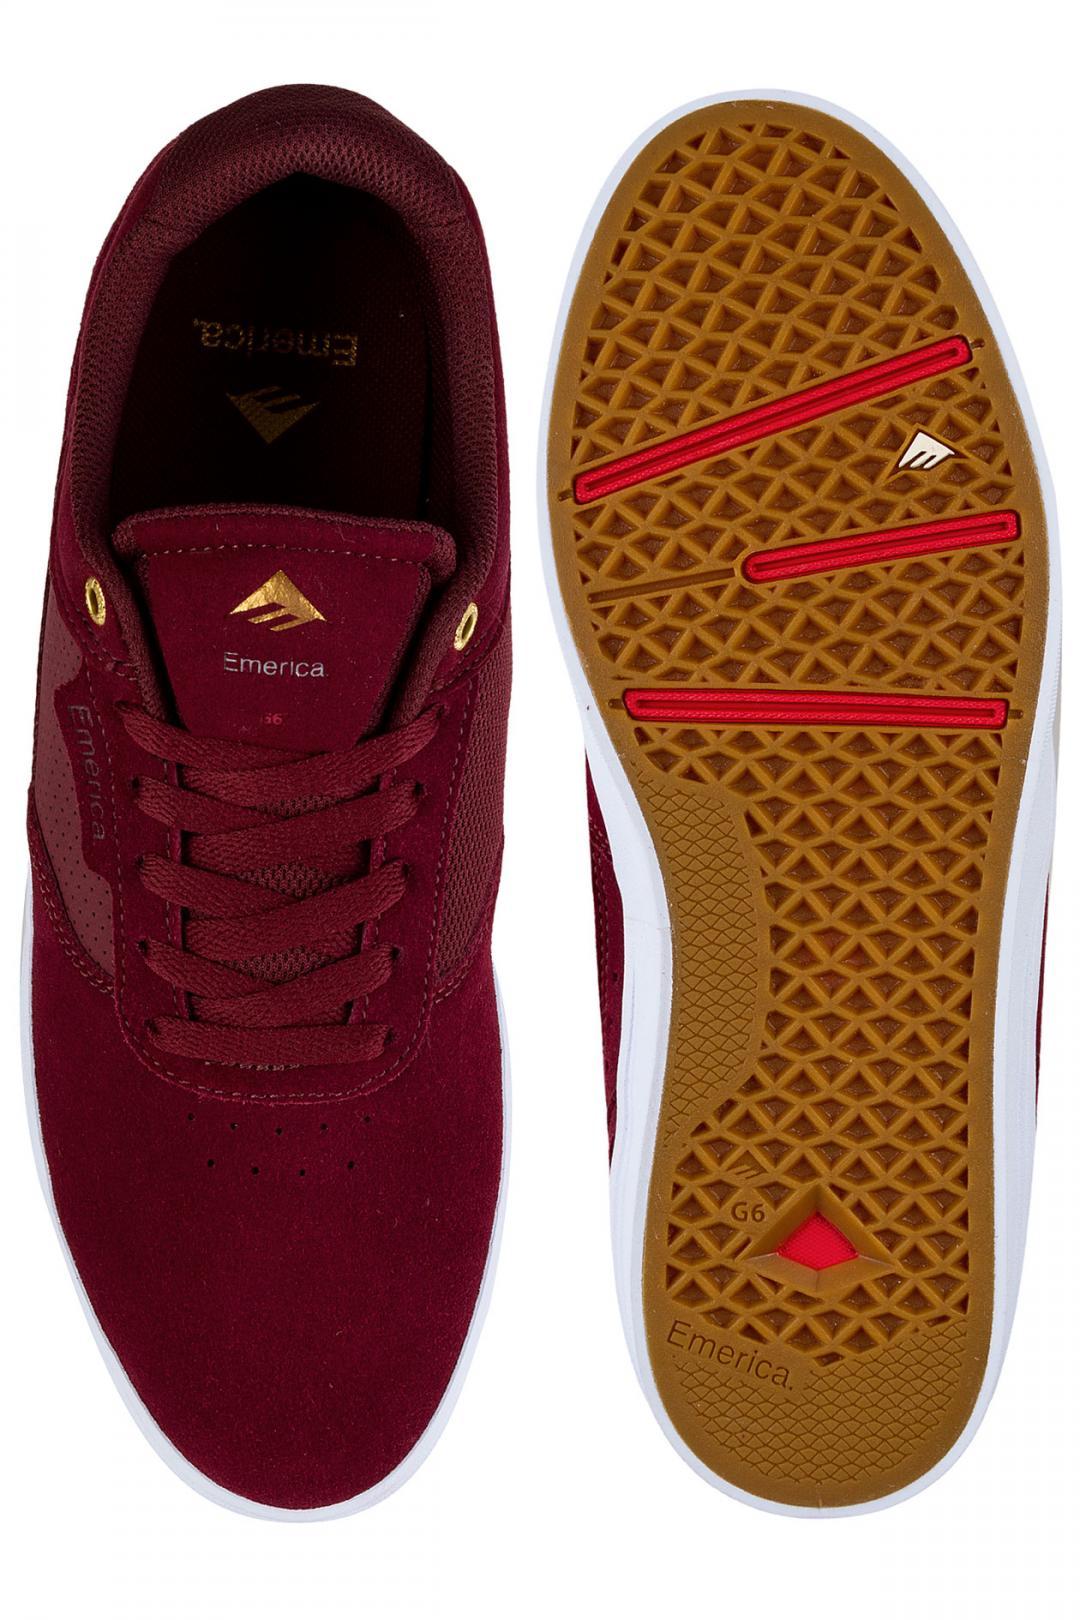 Uomo Emerica Empire G6 burgundy white | Sneaker